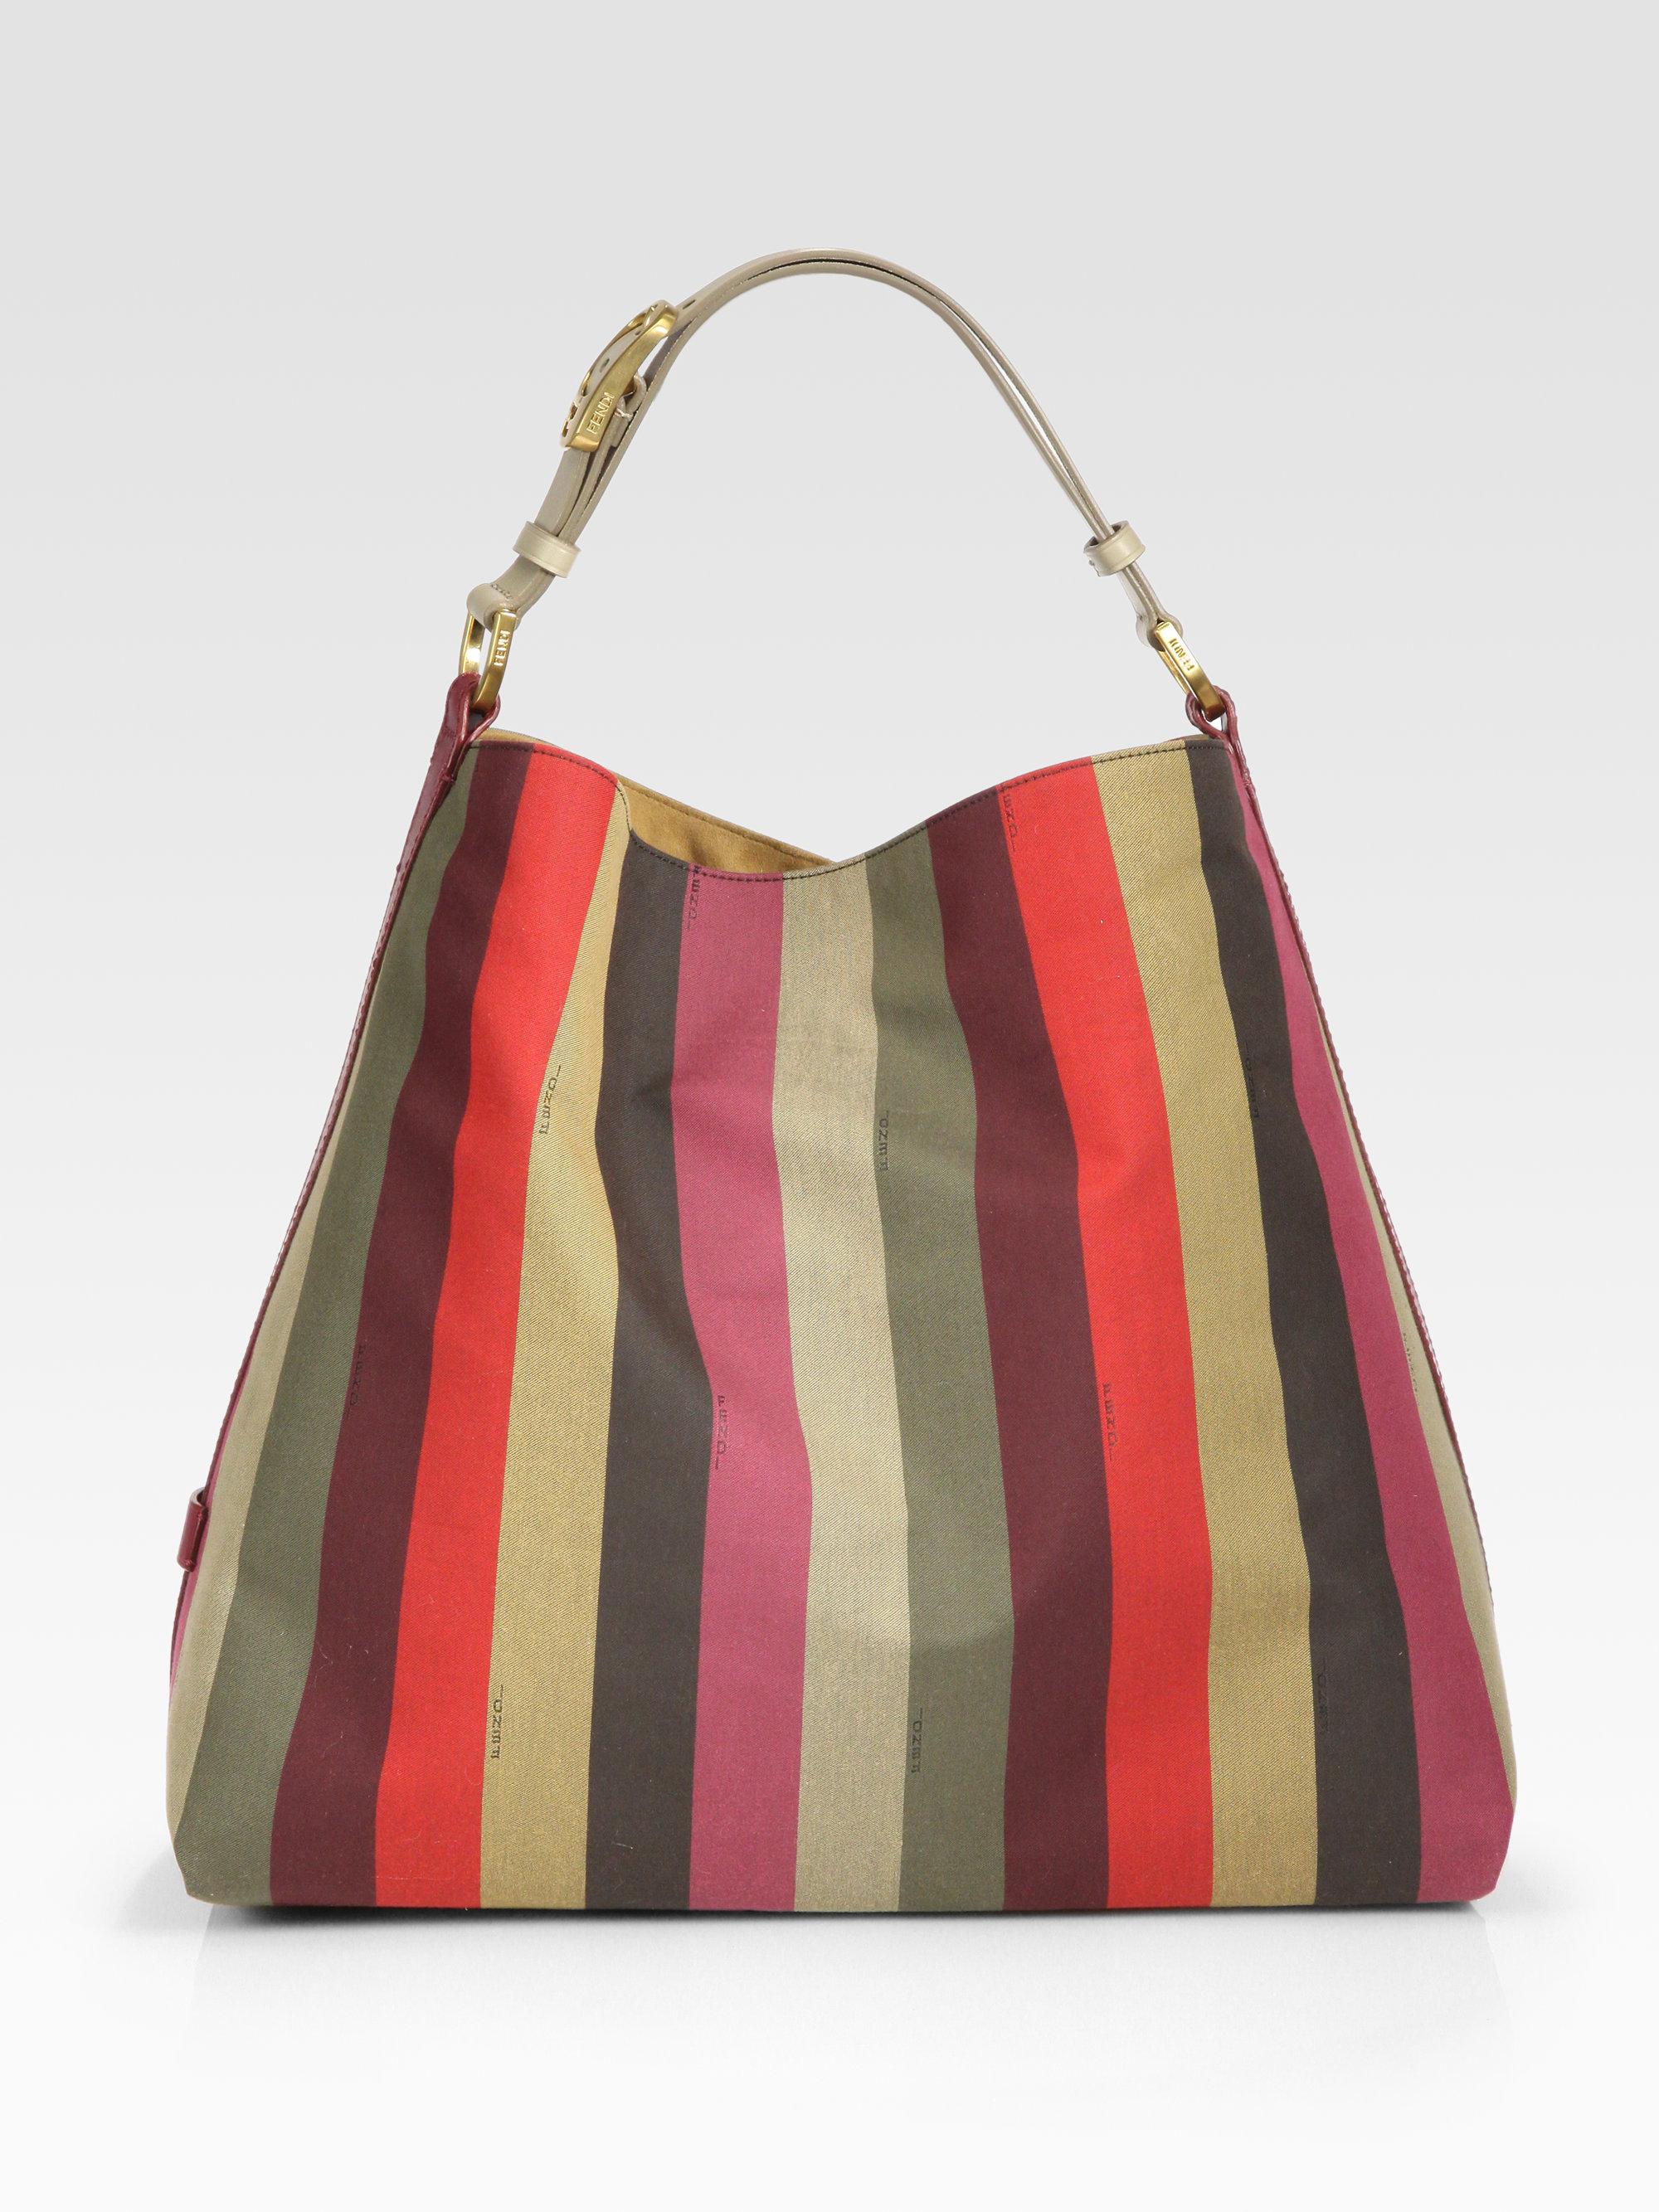 Fendi Hobo Handbags - Foto Handbag All Collections Salonagafiya.Com 16f9d43ddaed8